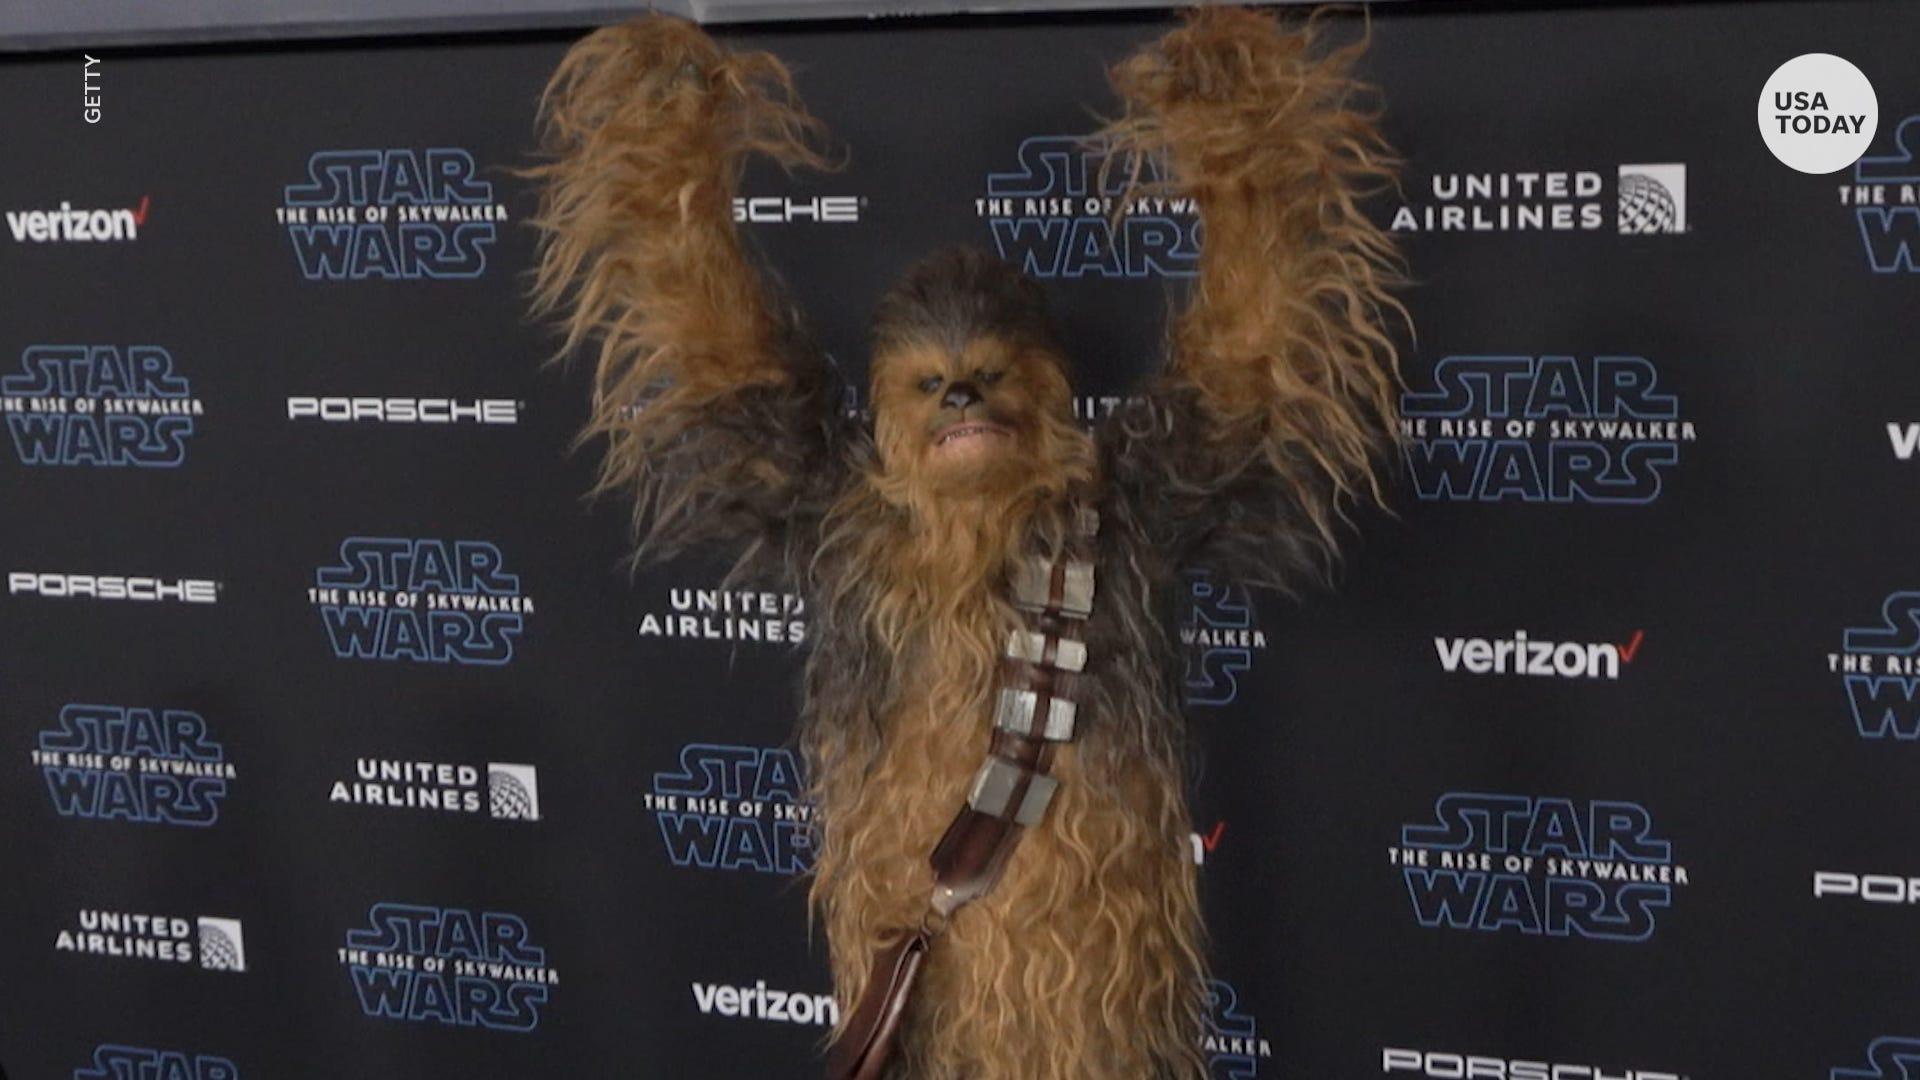 Star Wars Day From Films To Legos 6 Ways To Celebrate In Quarantine